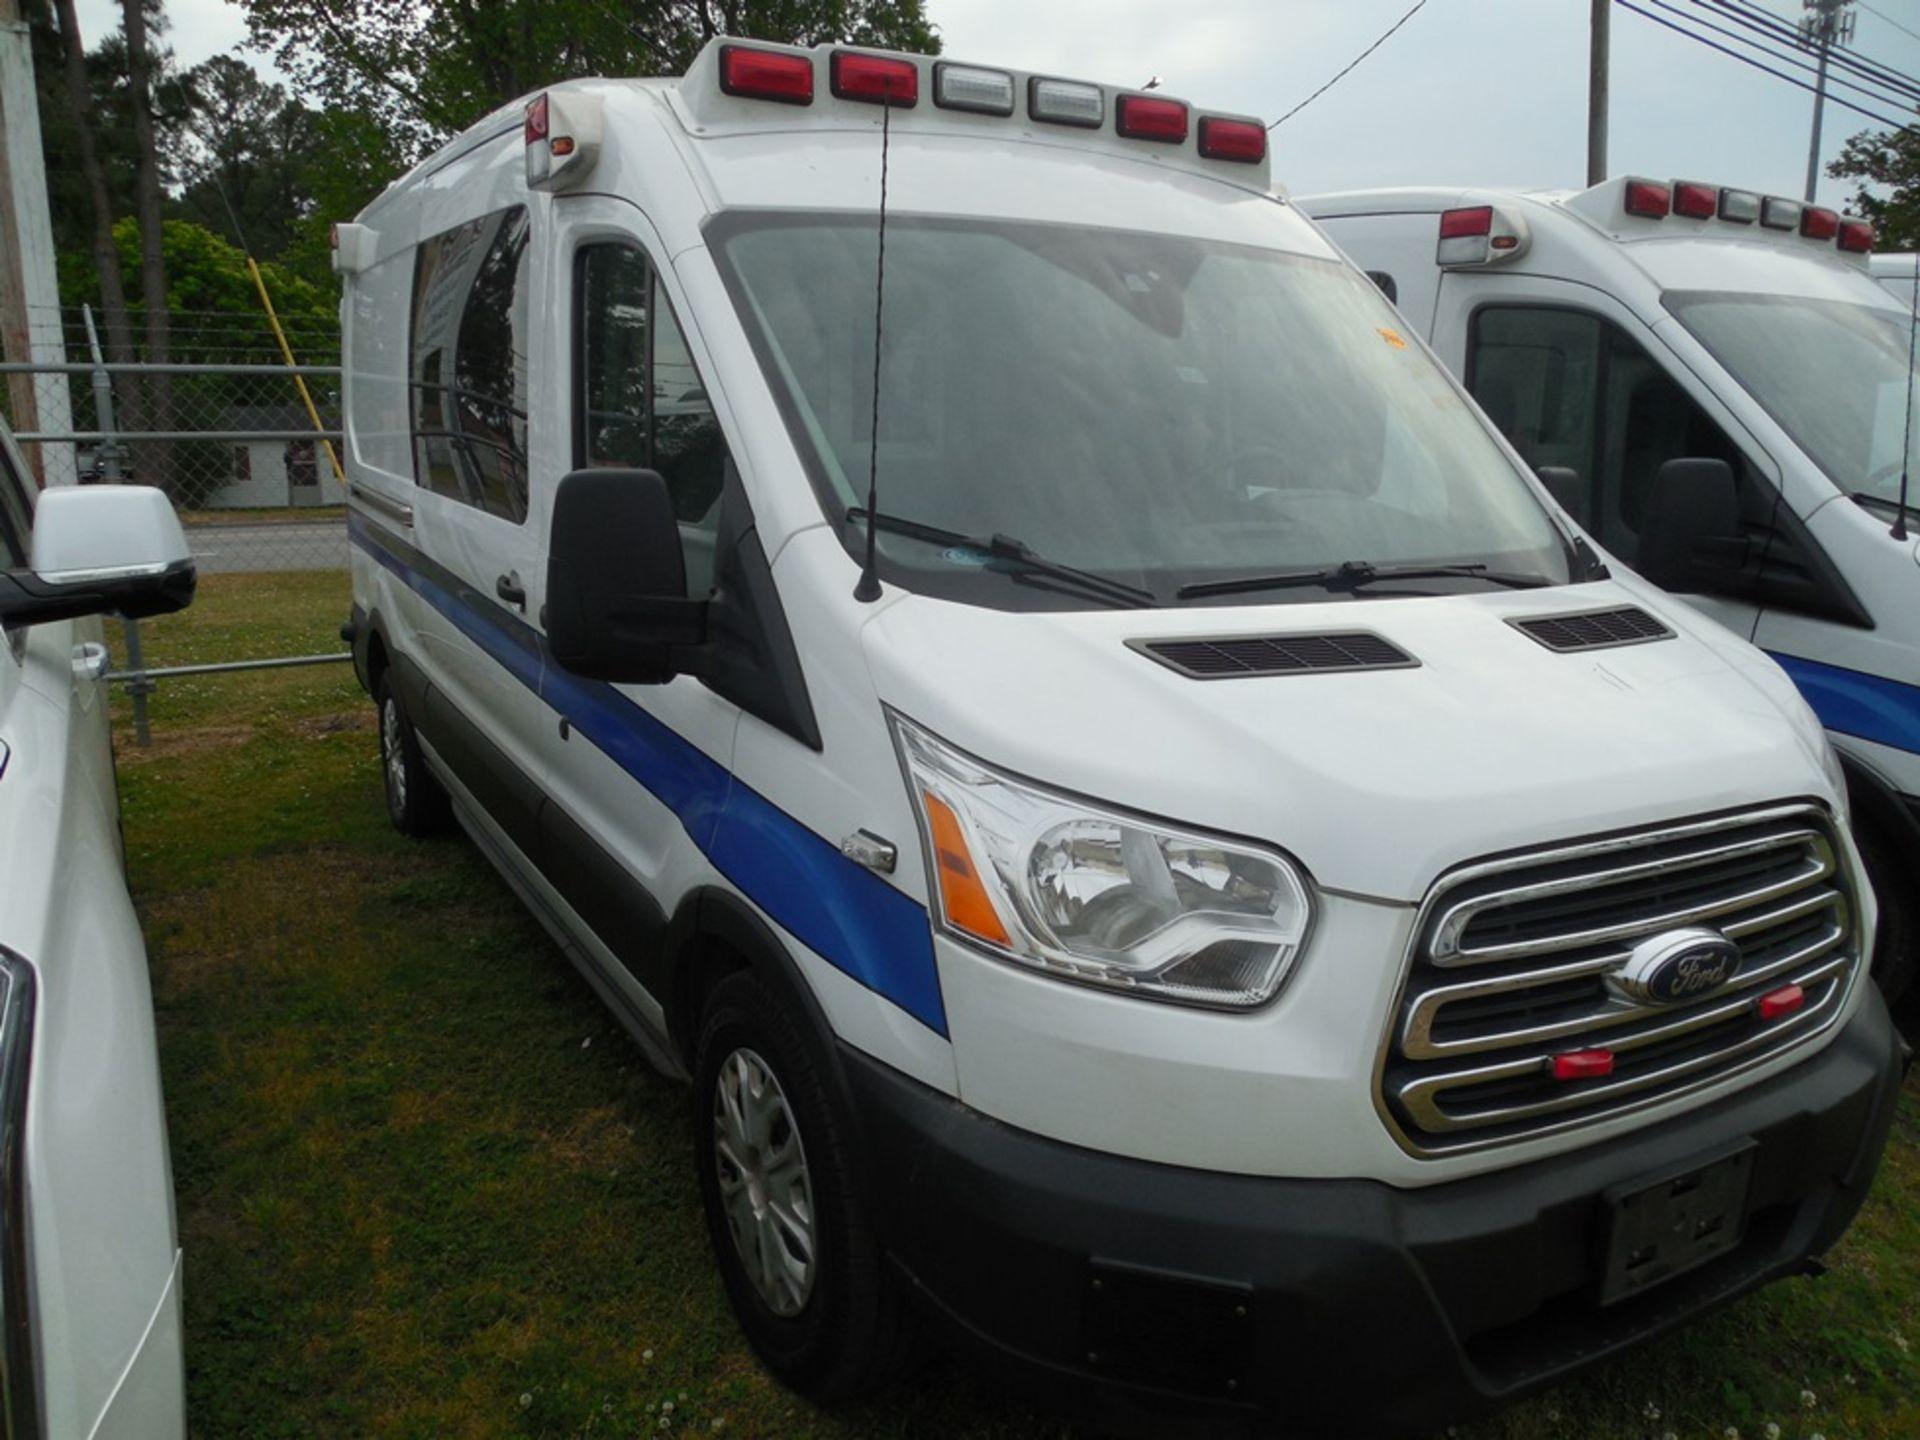 2017 Ford Tansit 250 dsl ambulance 165,029 miles vin# 1FDYR2CV0HKA57712 - Image 3 of 6